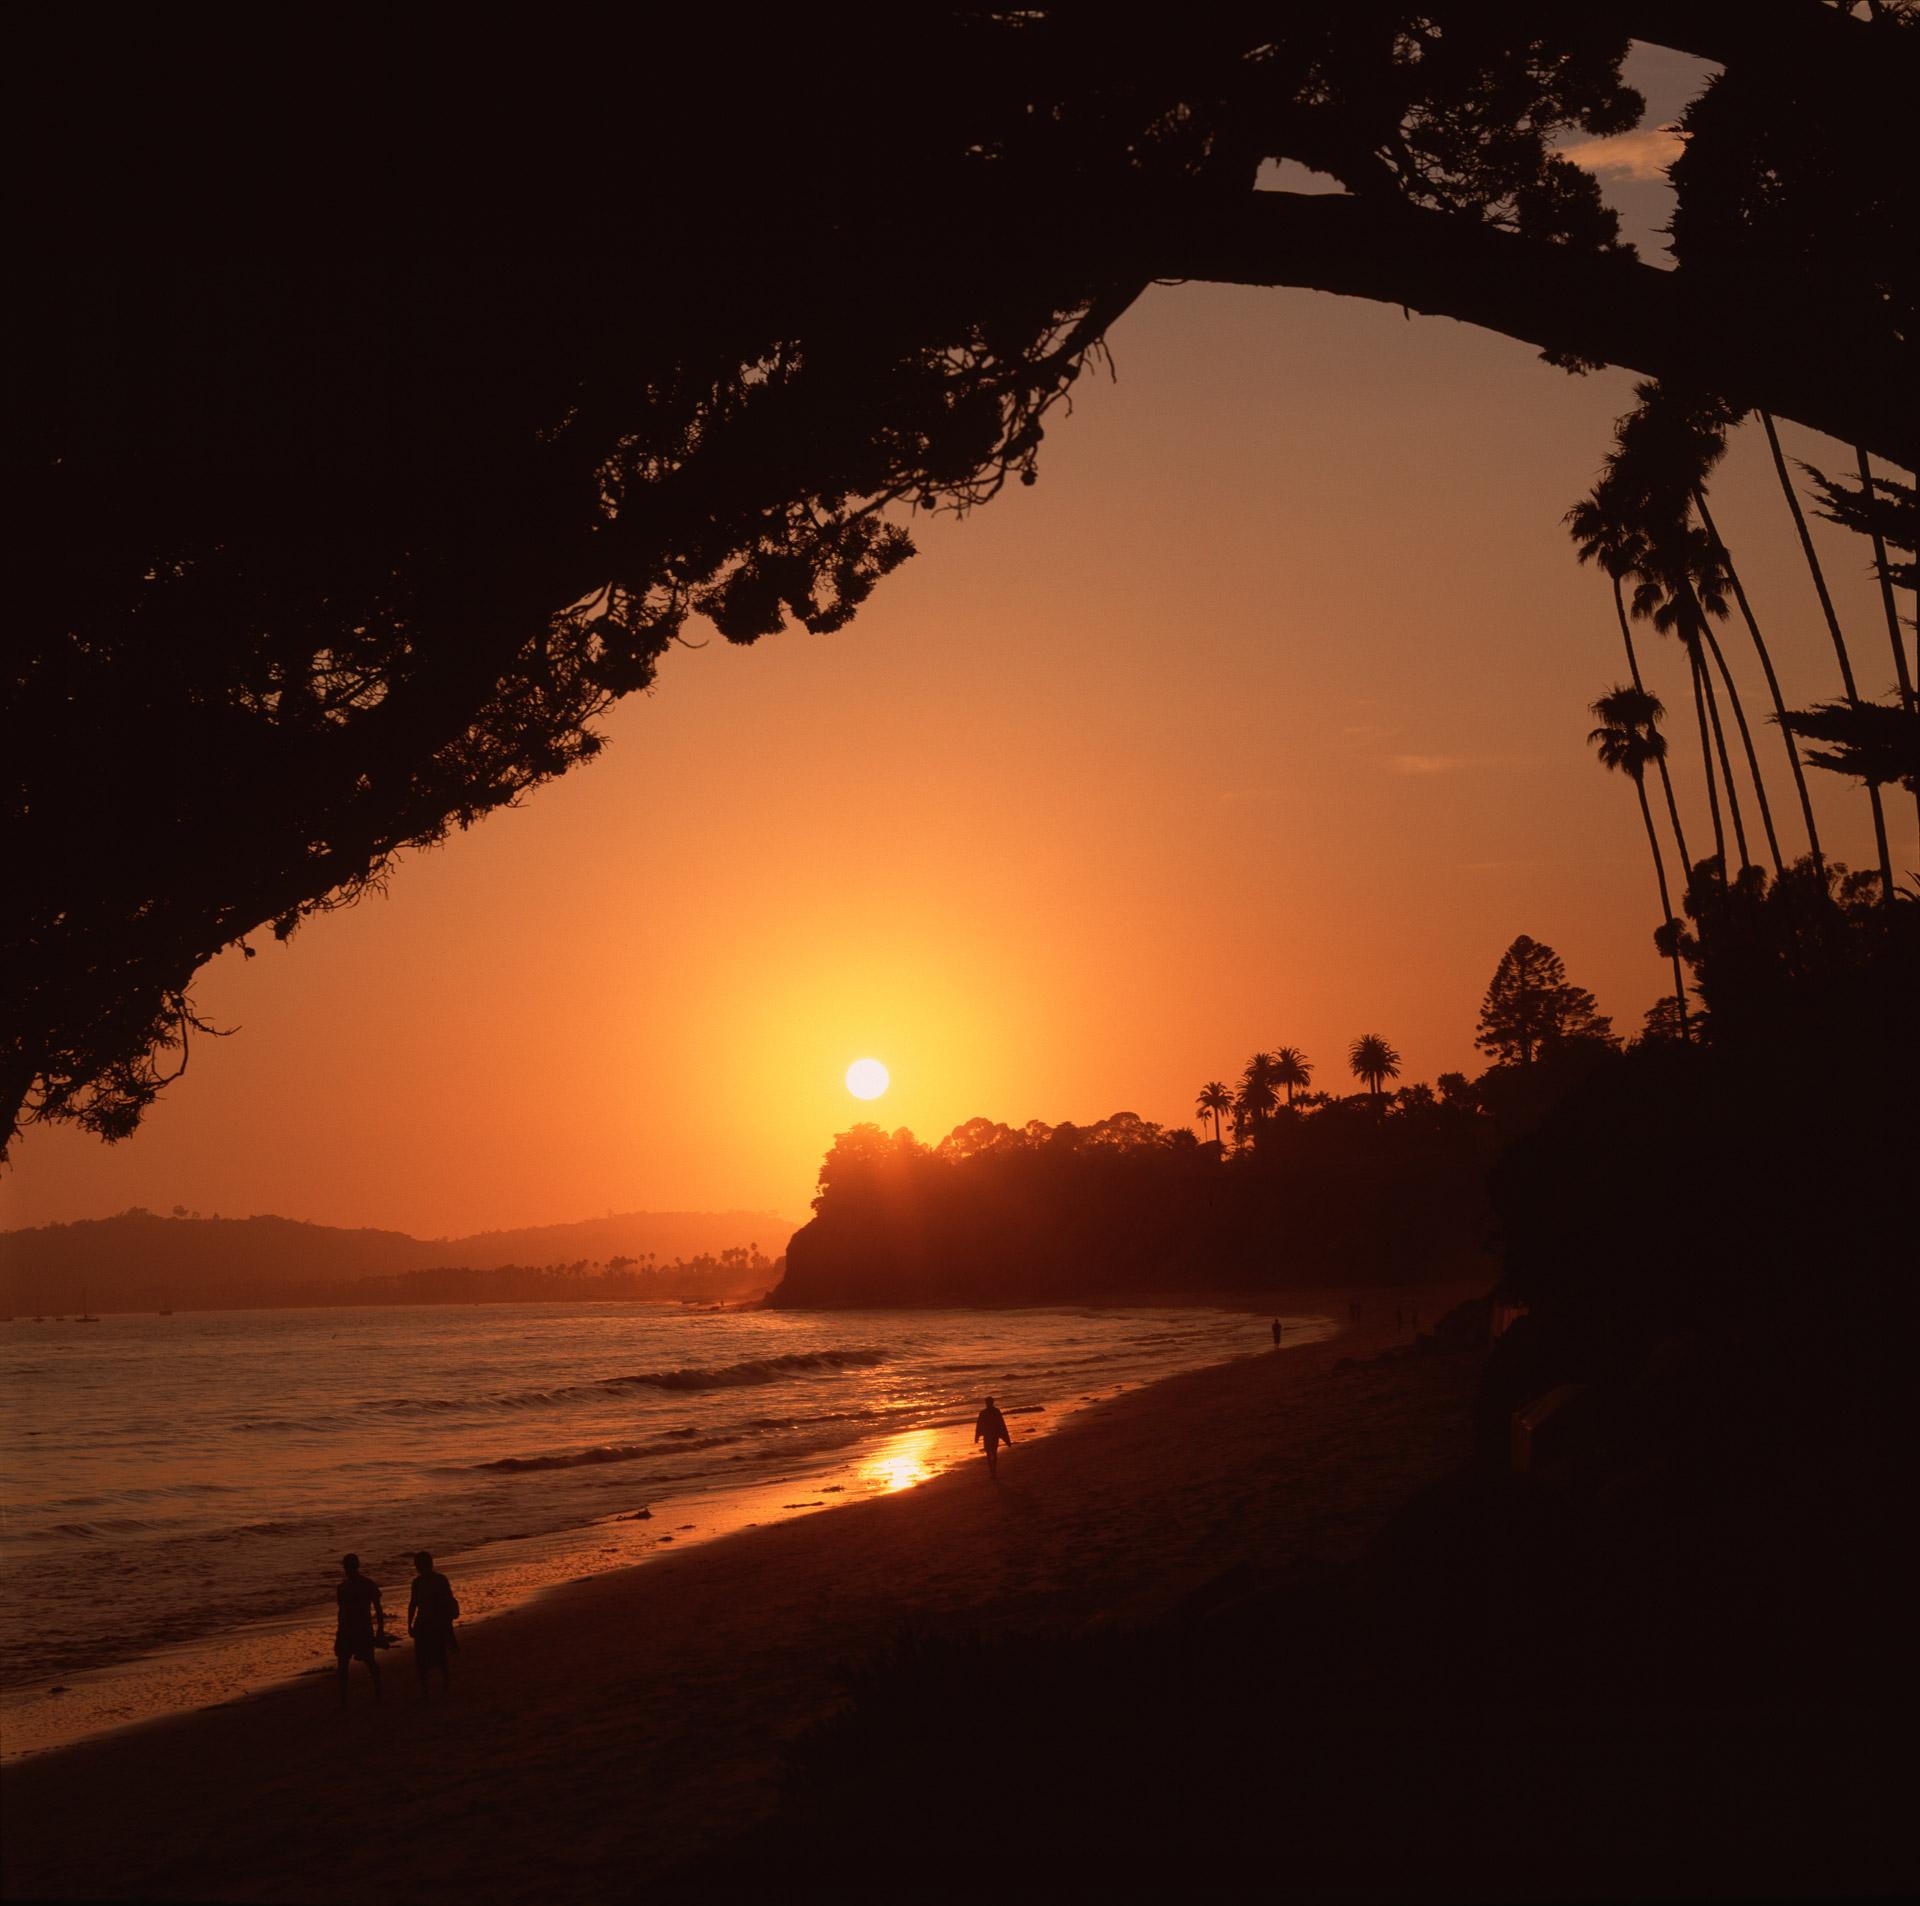 Sunset at Butterfly Beach in Santa Barbara California photographer Mikkel Alexander Grabowski